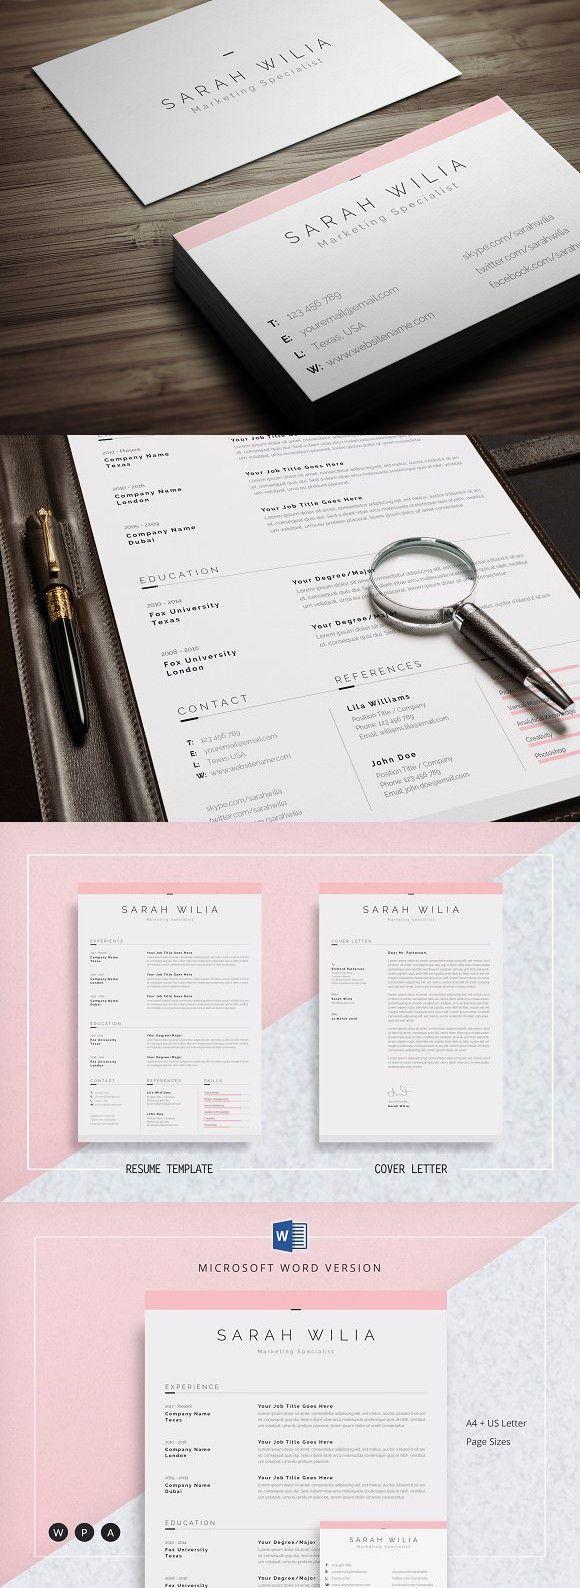 ResumeCV 791 best Resume Templates images on